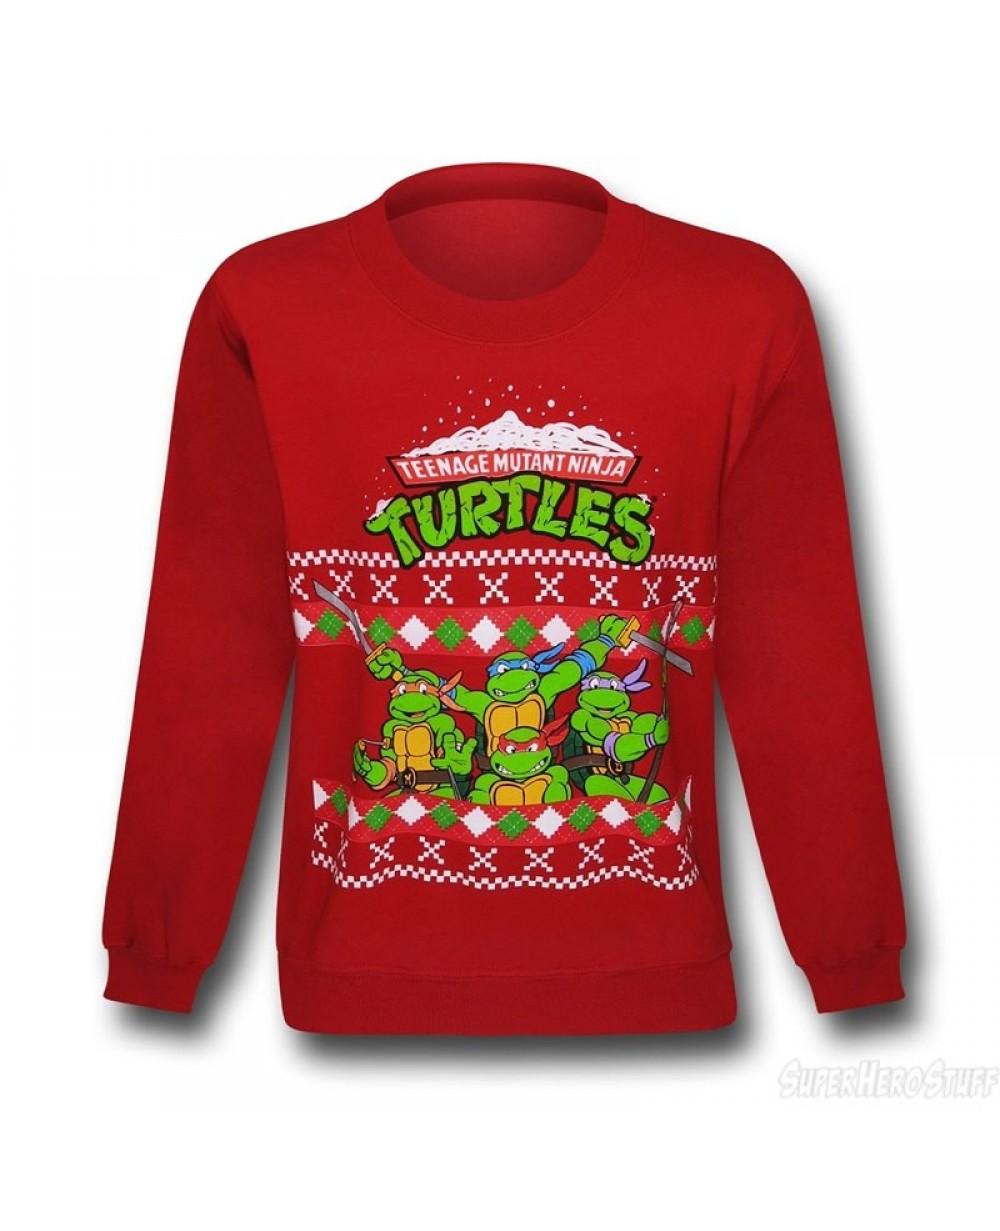 Superhero Ugly Christmas Sweaters.Teenage Mutant Ninja Turtles Ugly Christmas Sweater